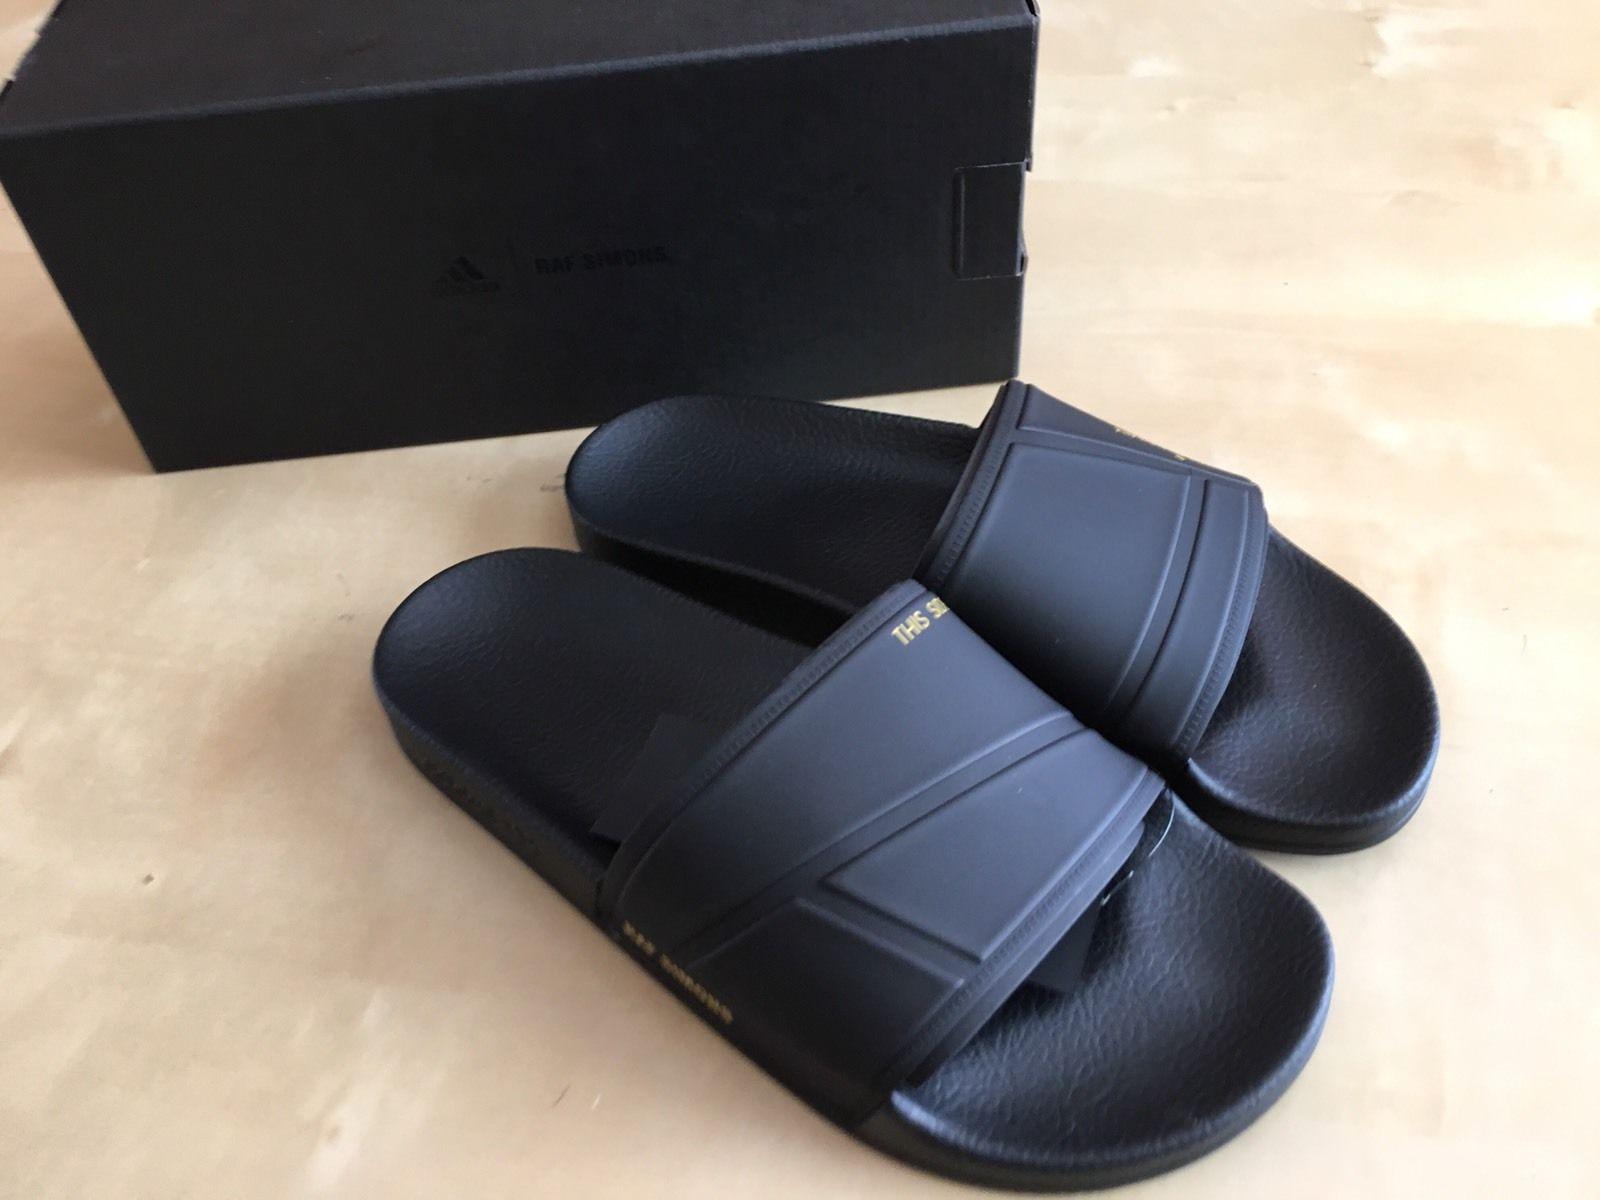 b9202113258d1 Adidas NEW ADIDAS RAF SIMONS BUNNY ADILETTE SLIDE Size 7 Size 7 - Sandals  for Sale - Grailed